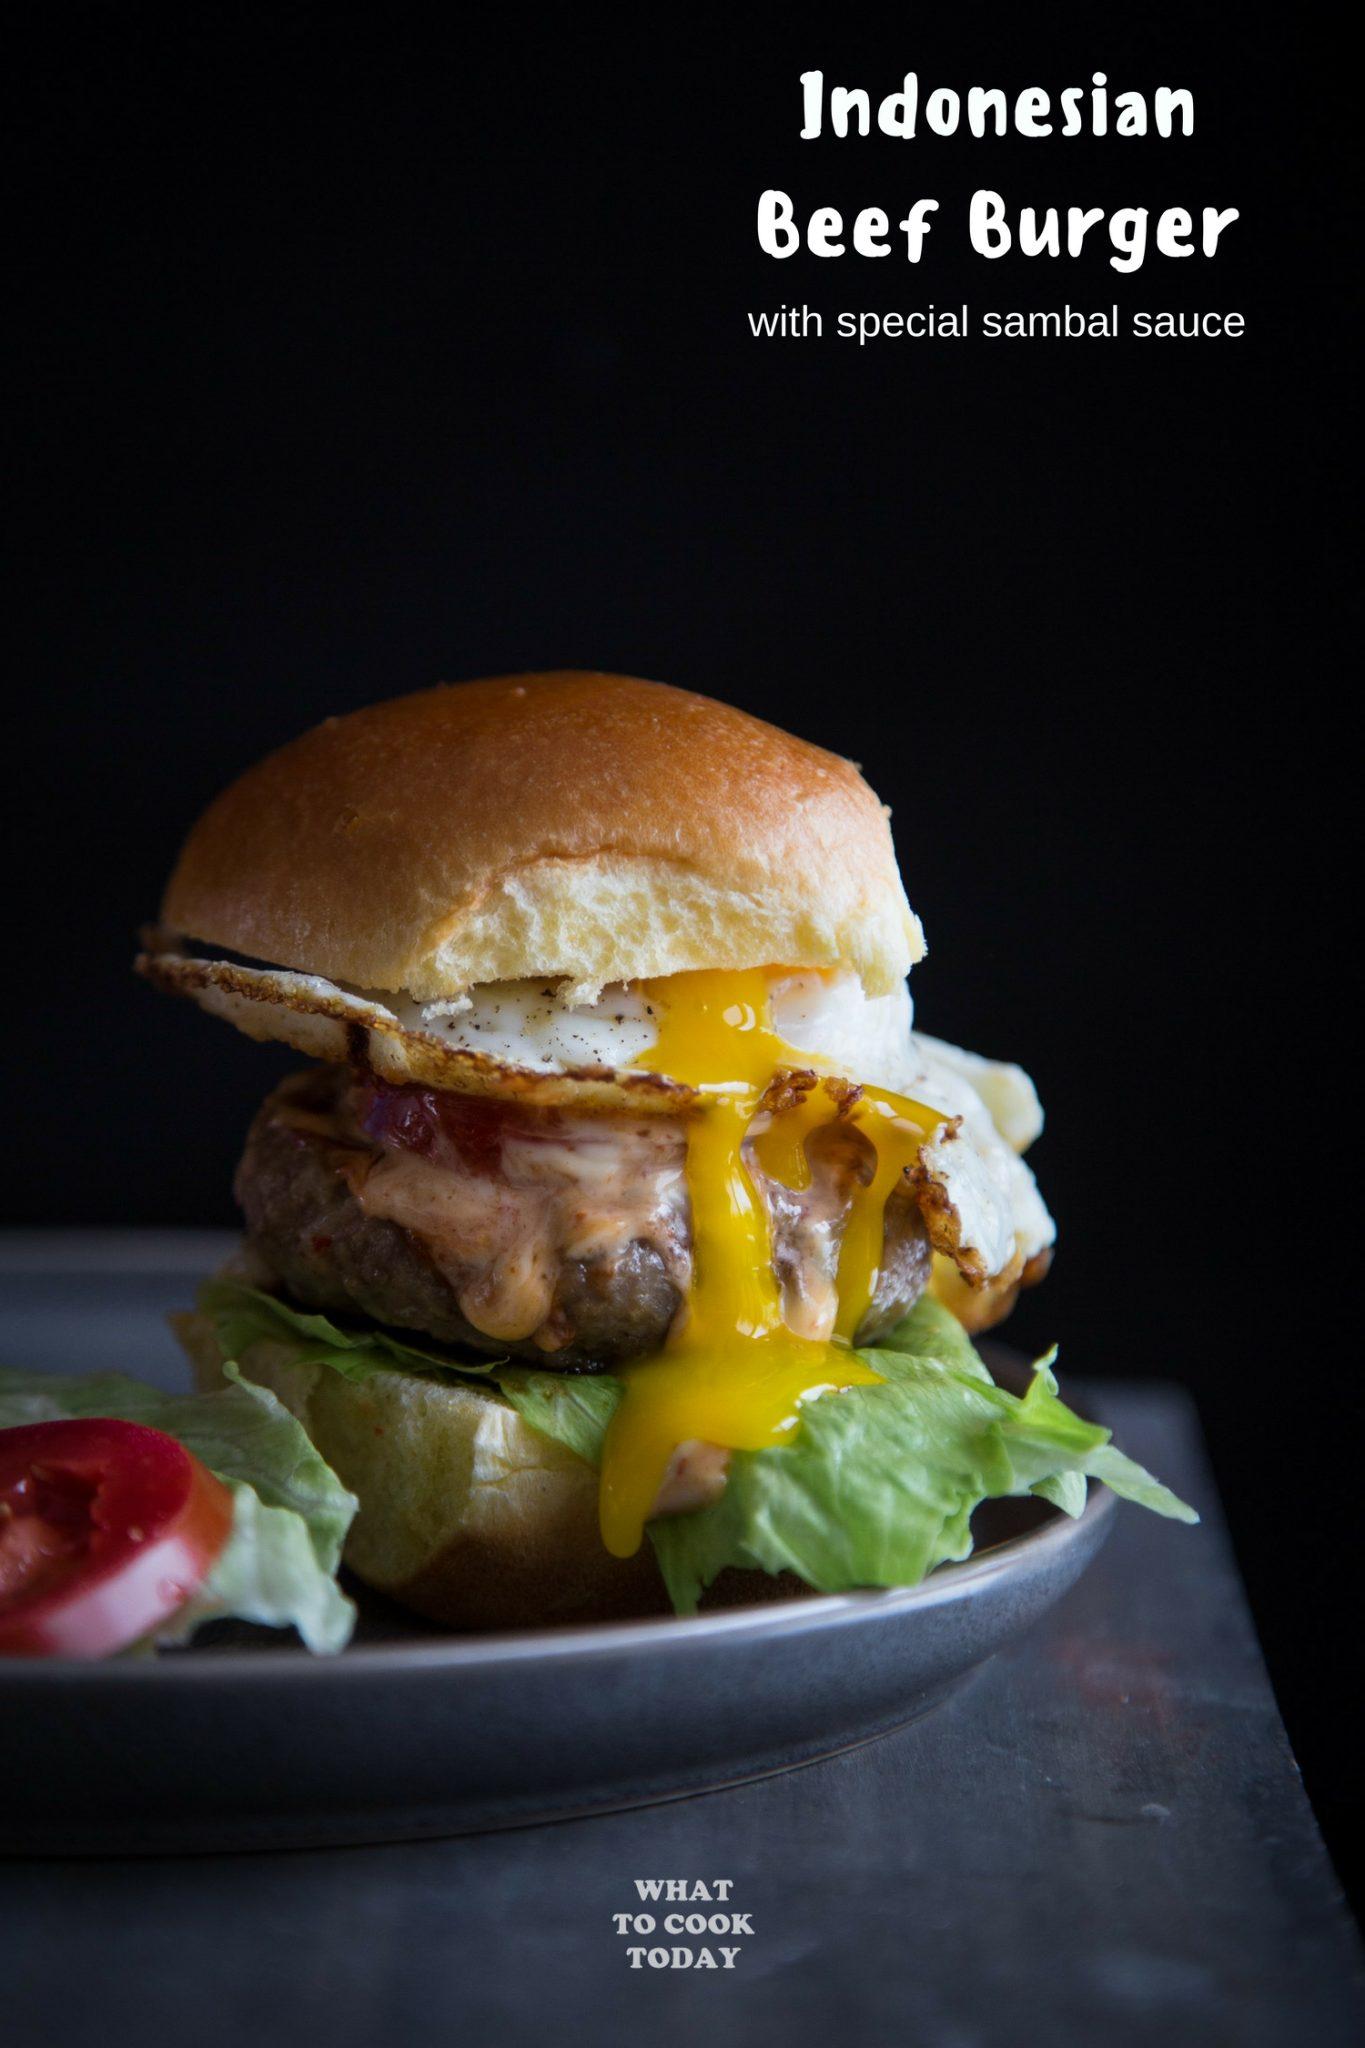 Burger Daging Sapi (Indonesian Beef Burger) #burger #beef #kewpiemayo #sambal